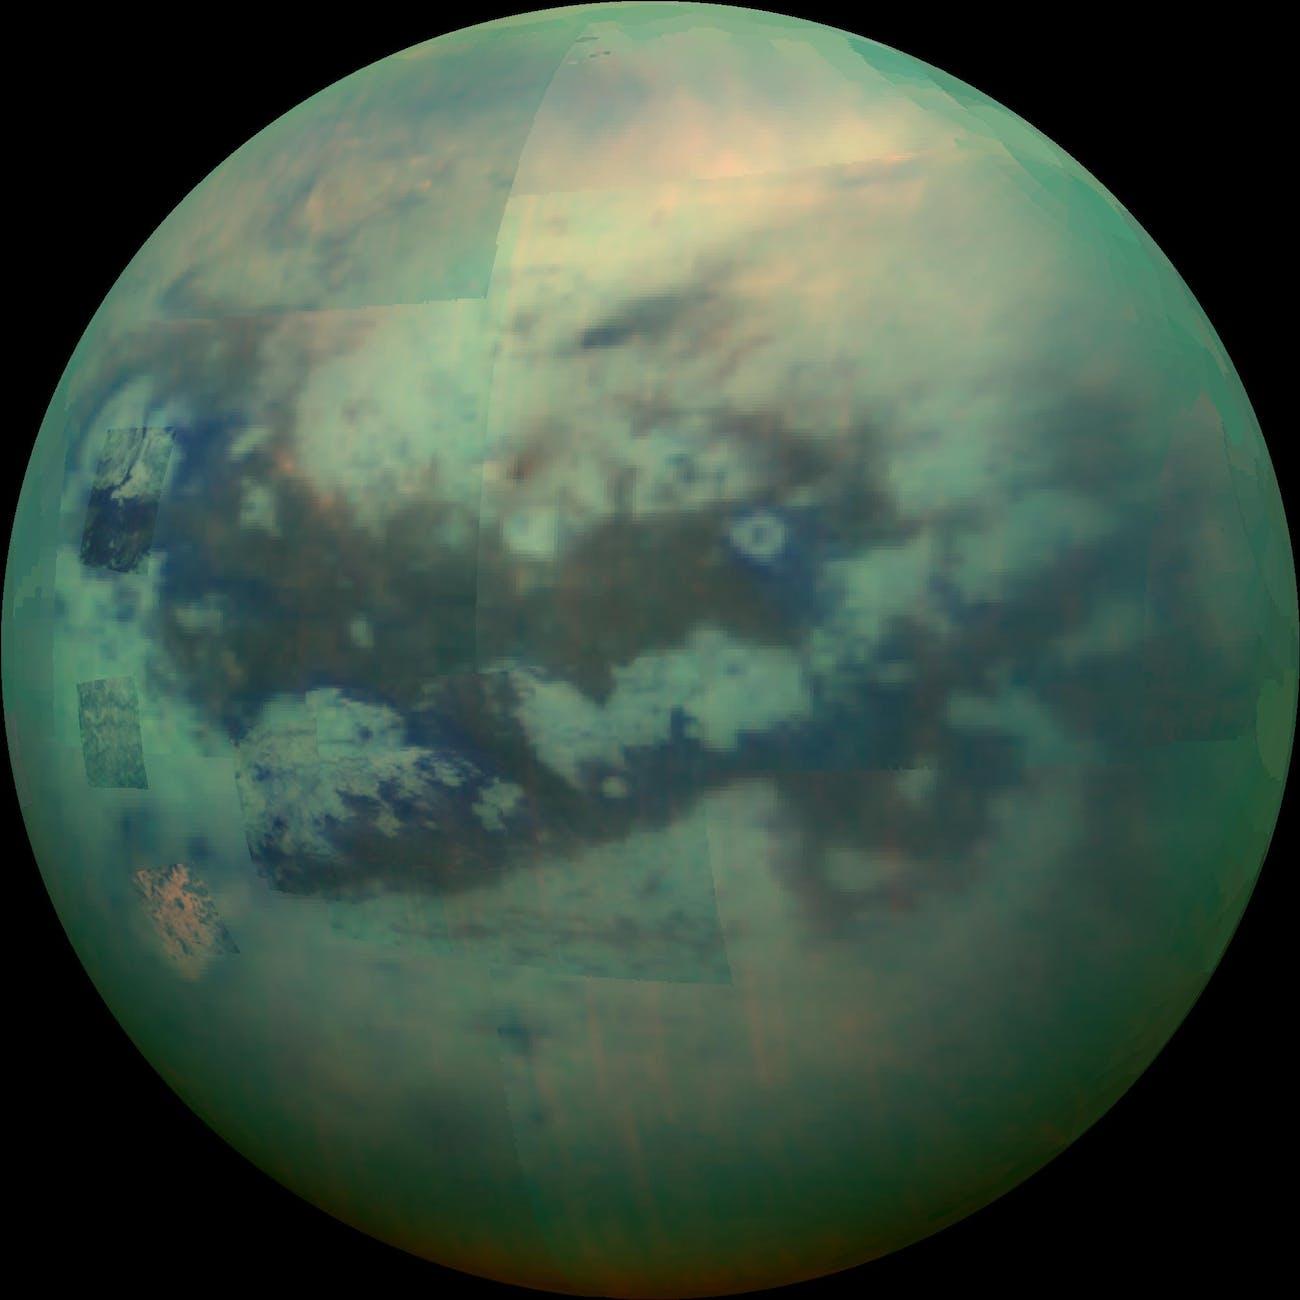 Saturn moon Titan NASA cassini image